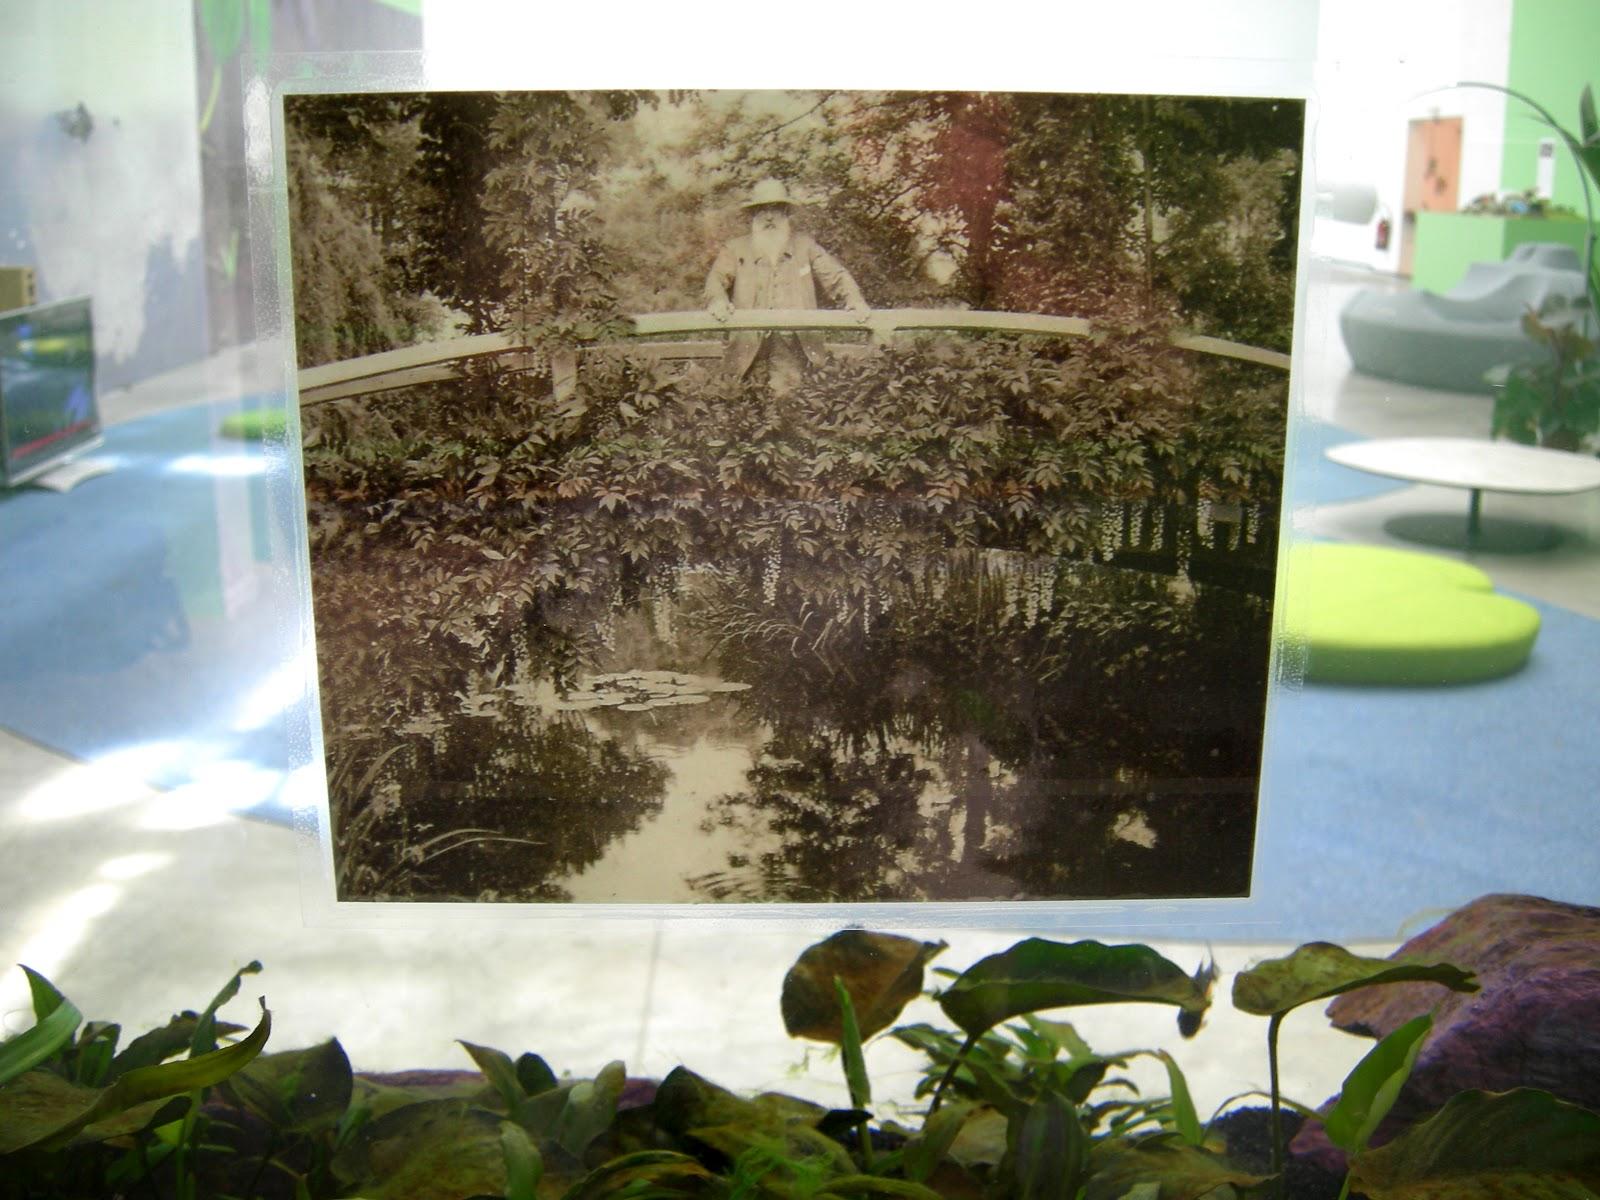 Monet's piranha soup 8 (Piranha's tank with Monet).jpg